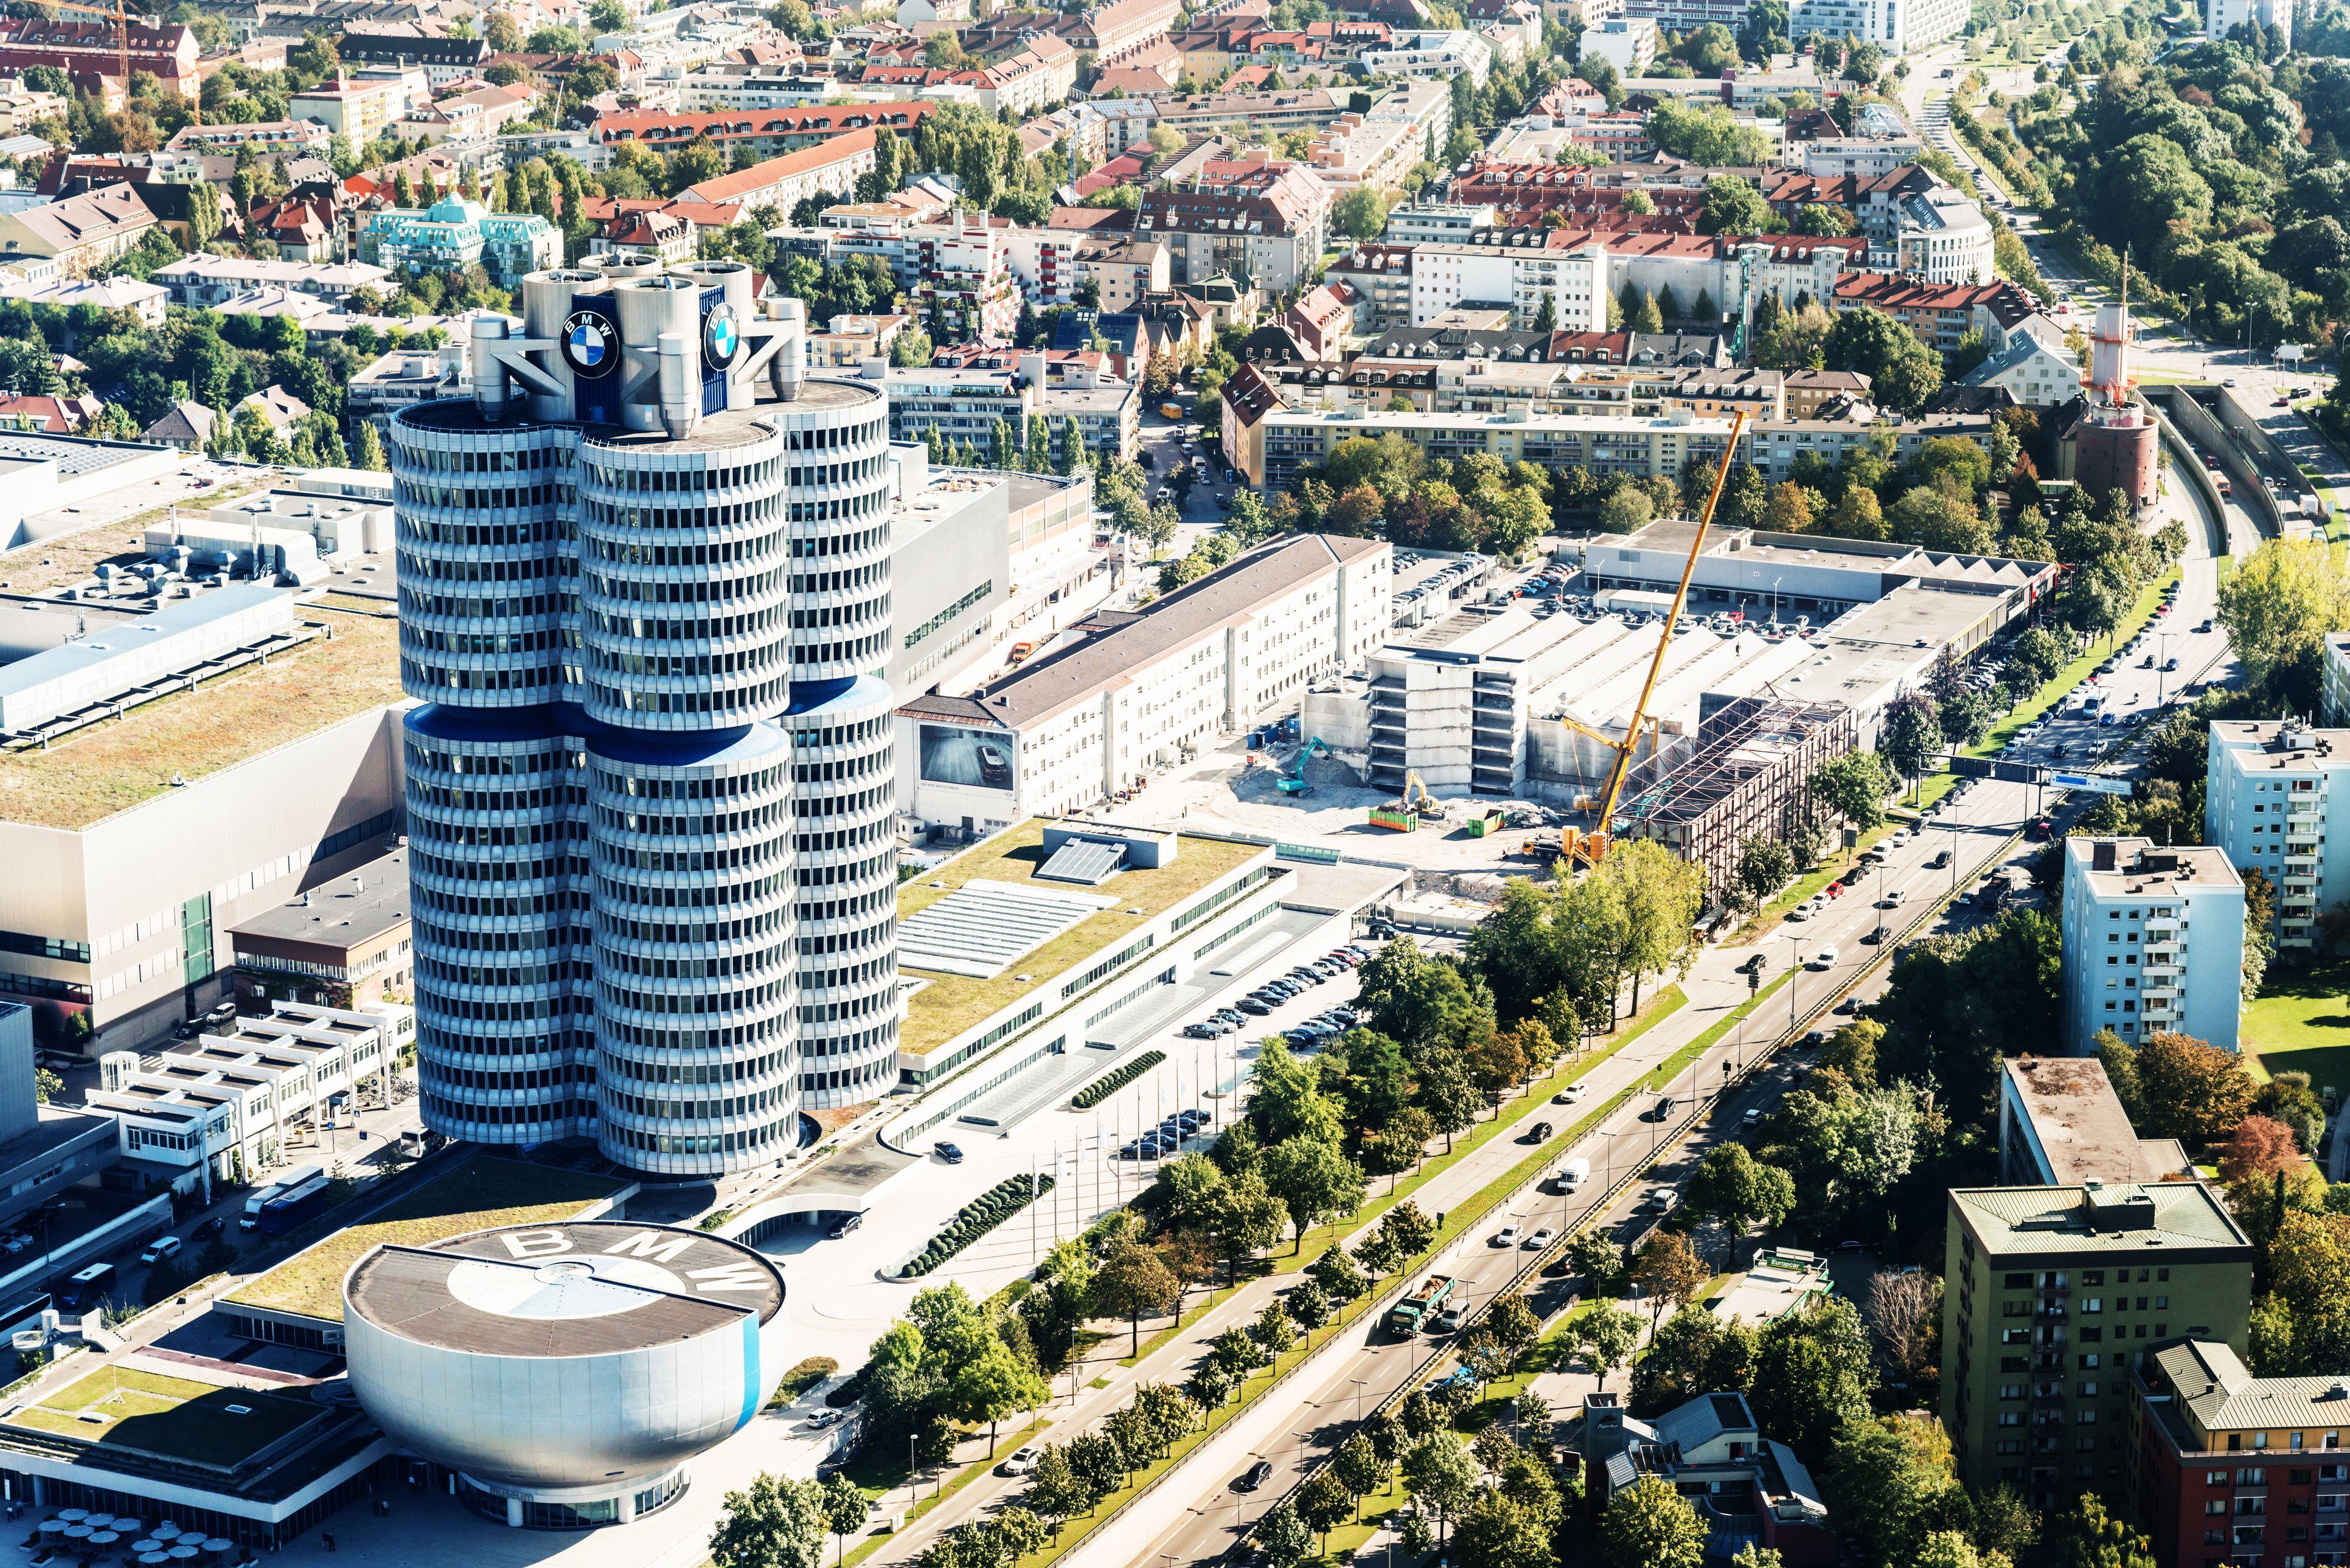 Aerial view of Munich with BMW Headquarter